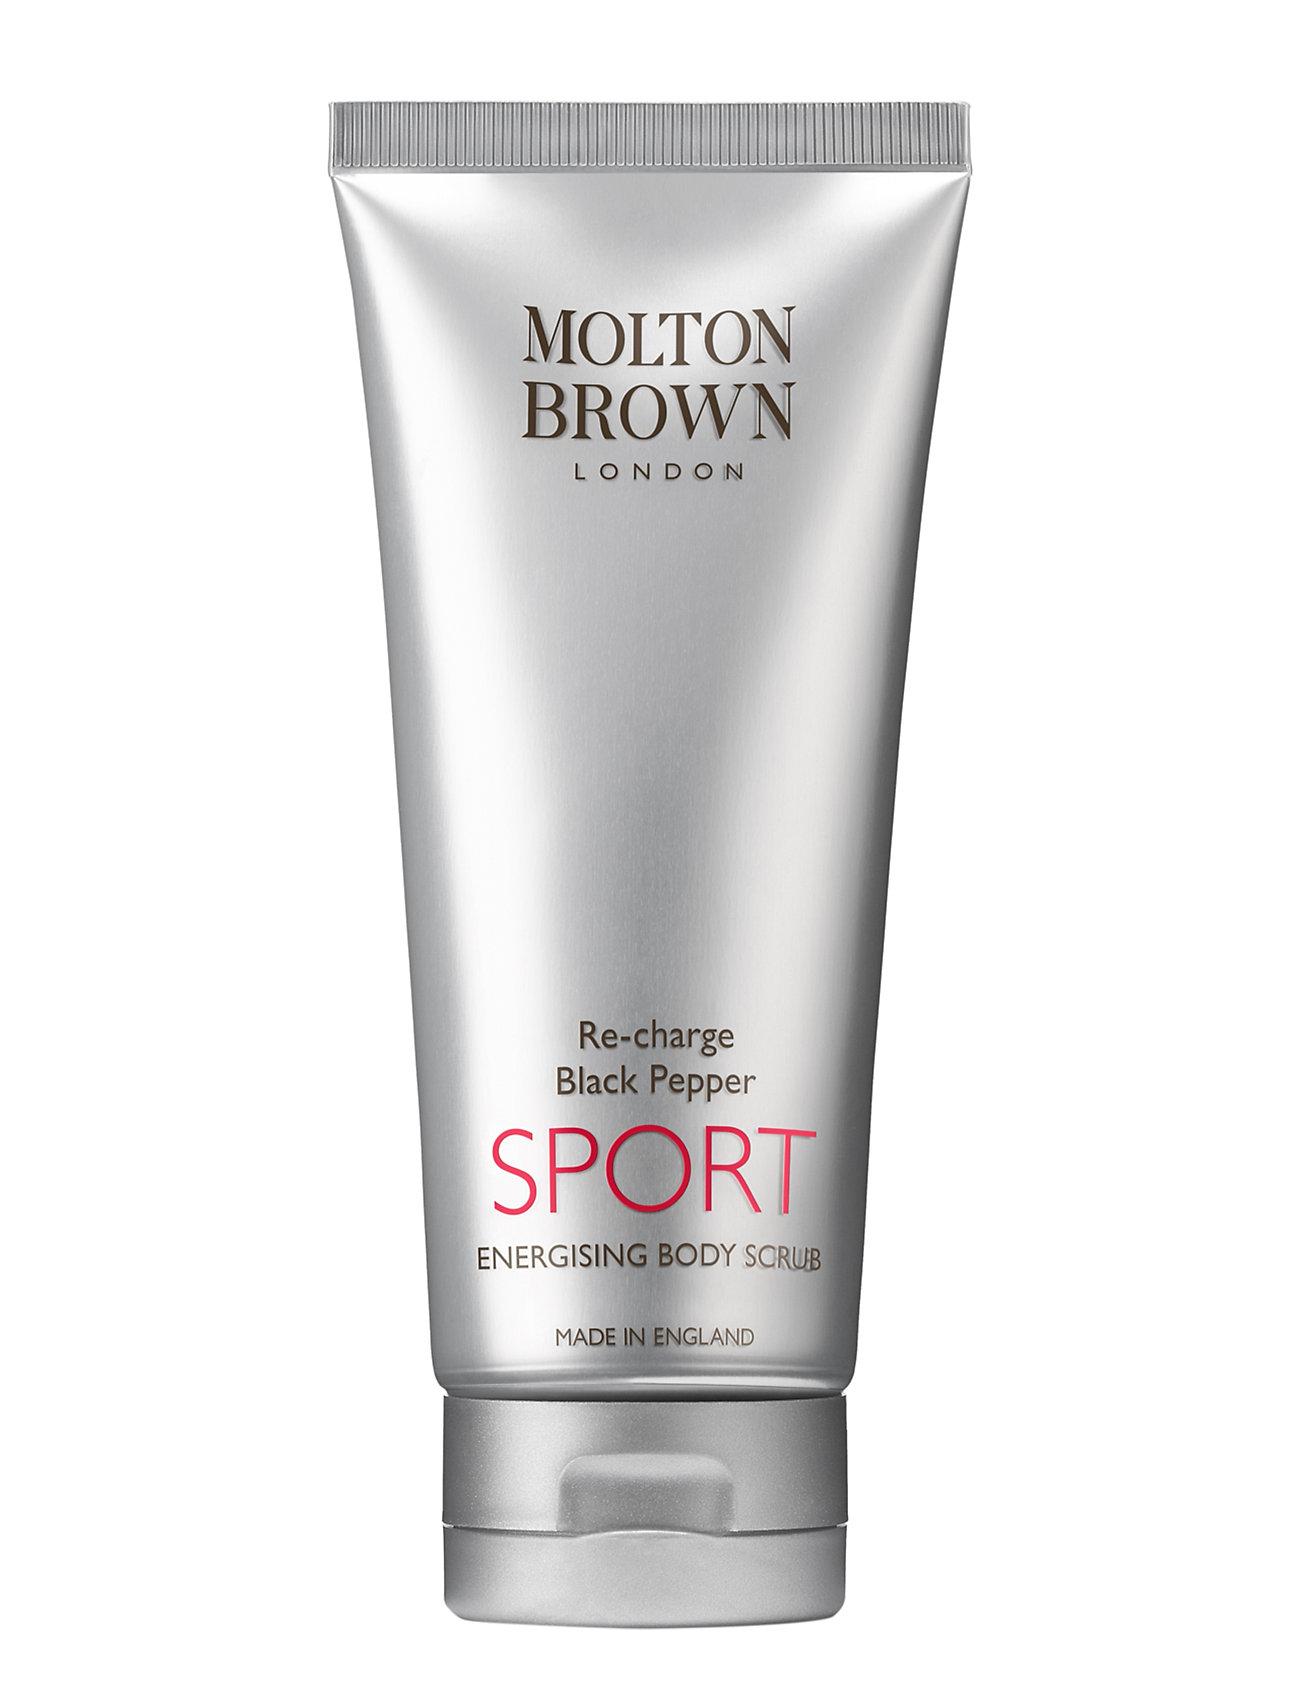 Molton Brown Re-Charge Black Pepper Sport Energising Body Scrub - NO COLOUR